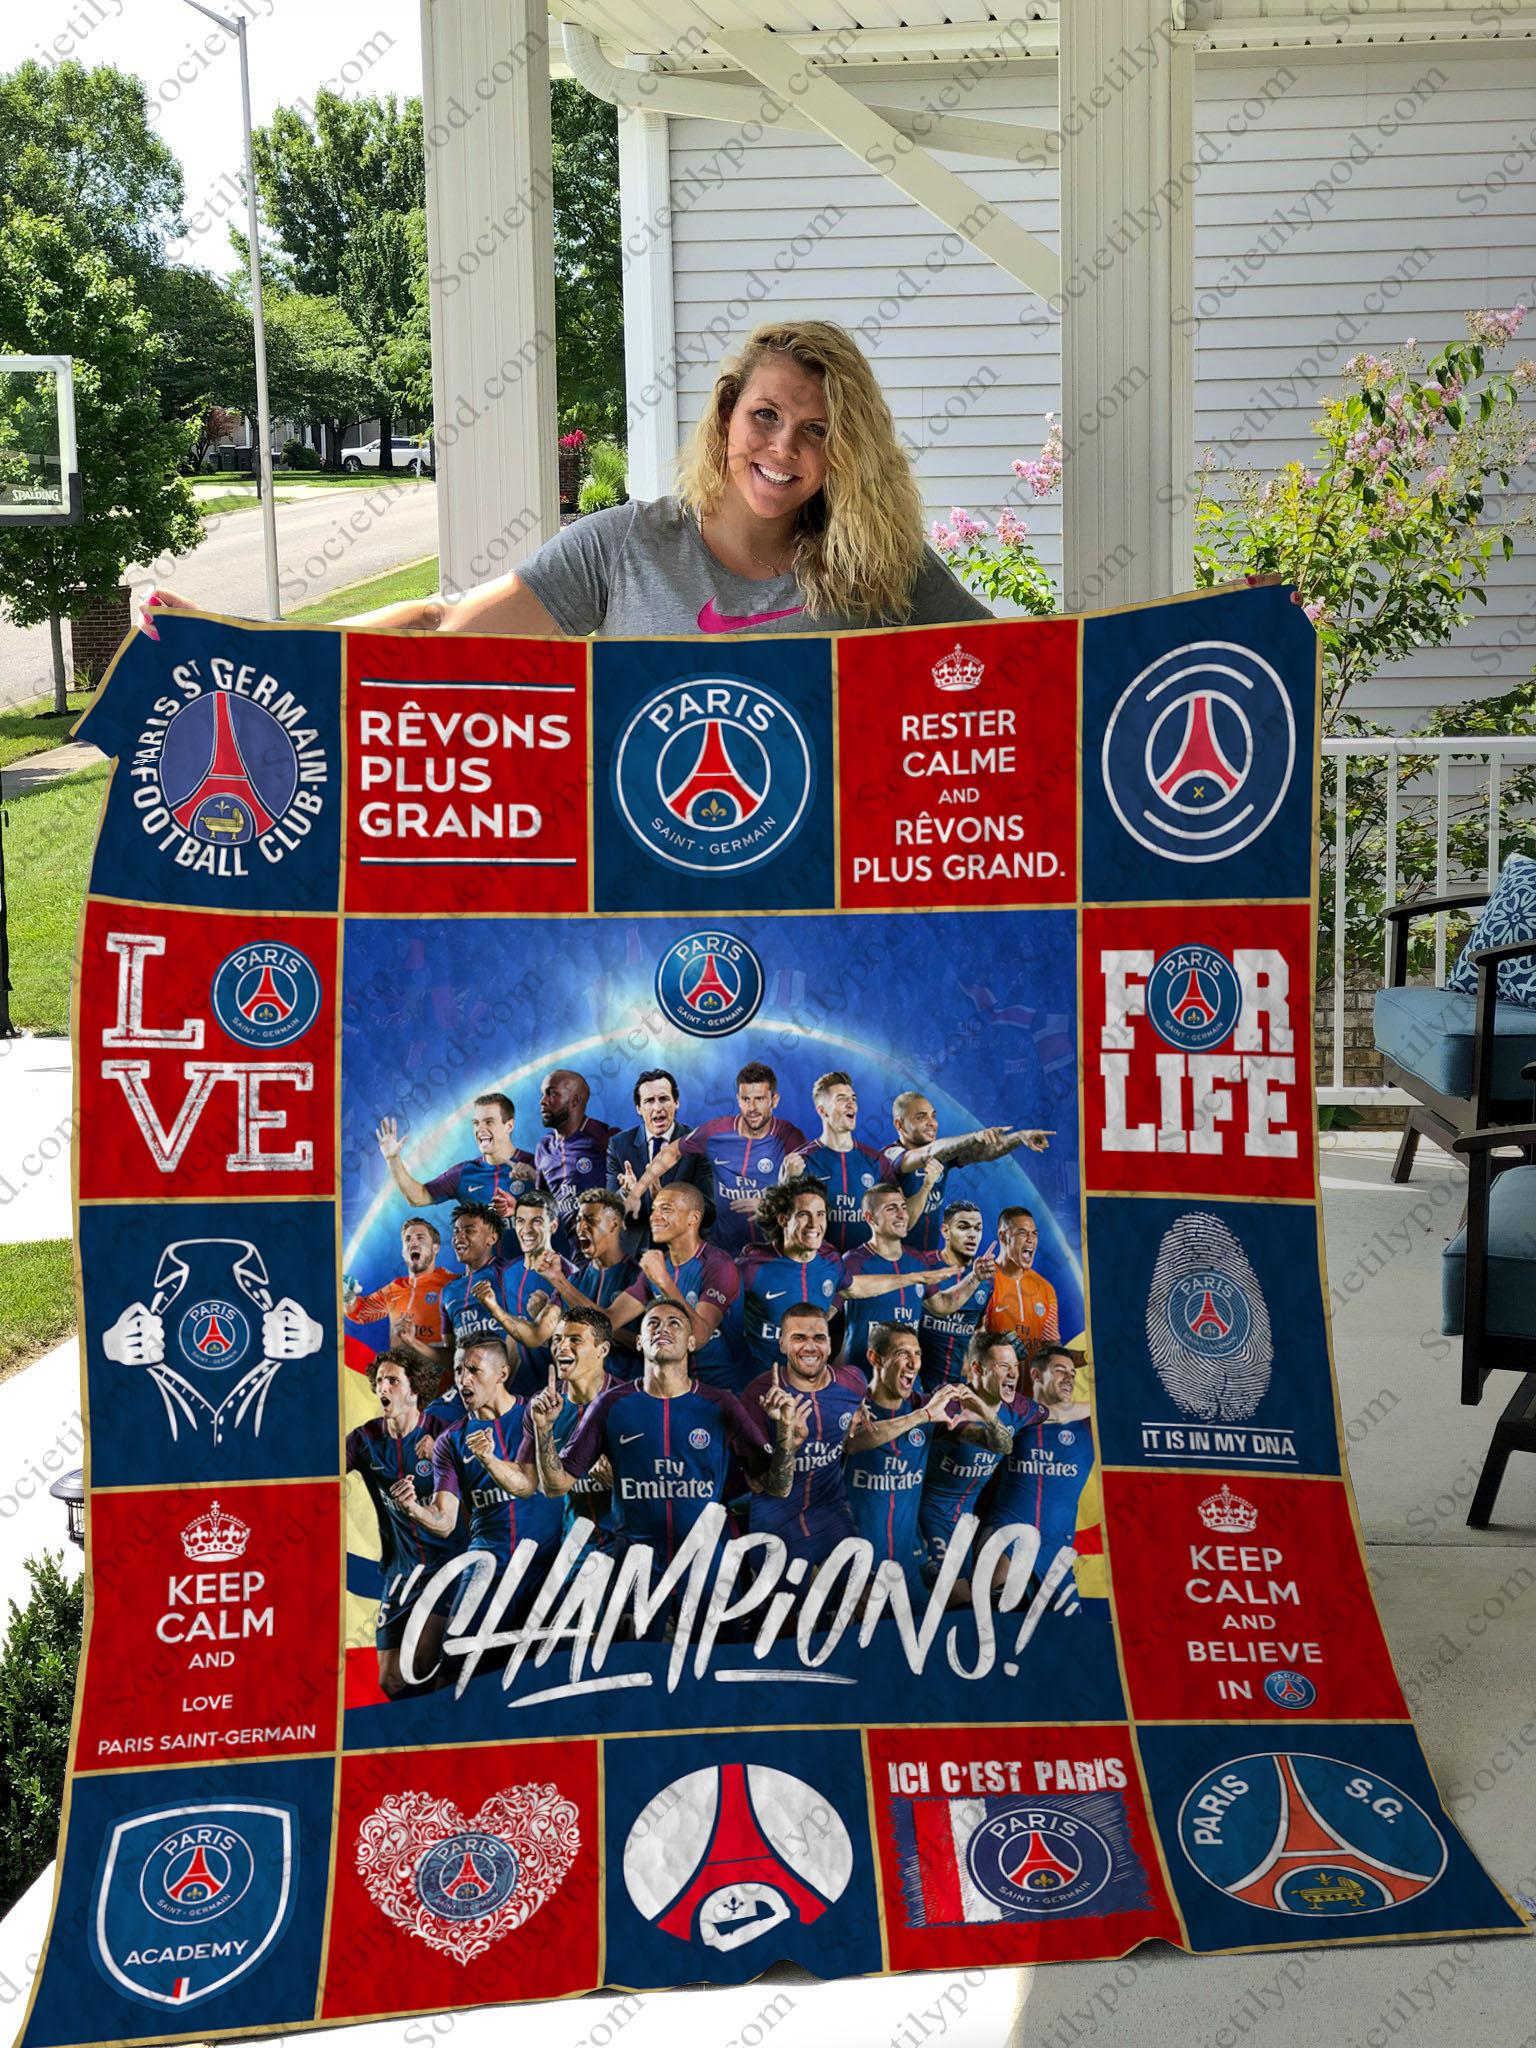 paris saint-germain football club full printing quilt 1 - Copy